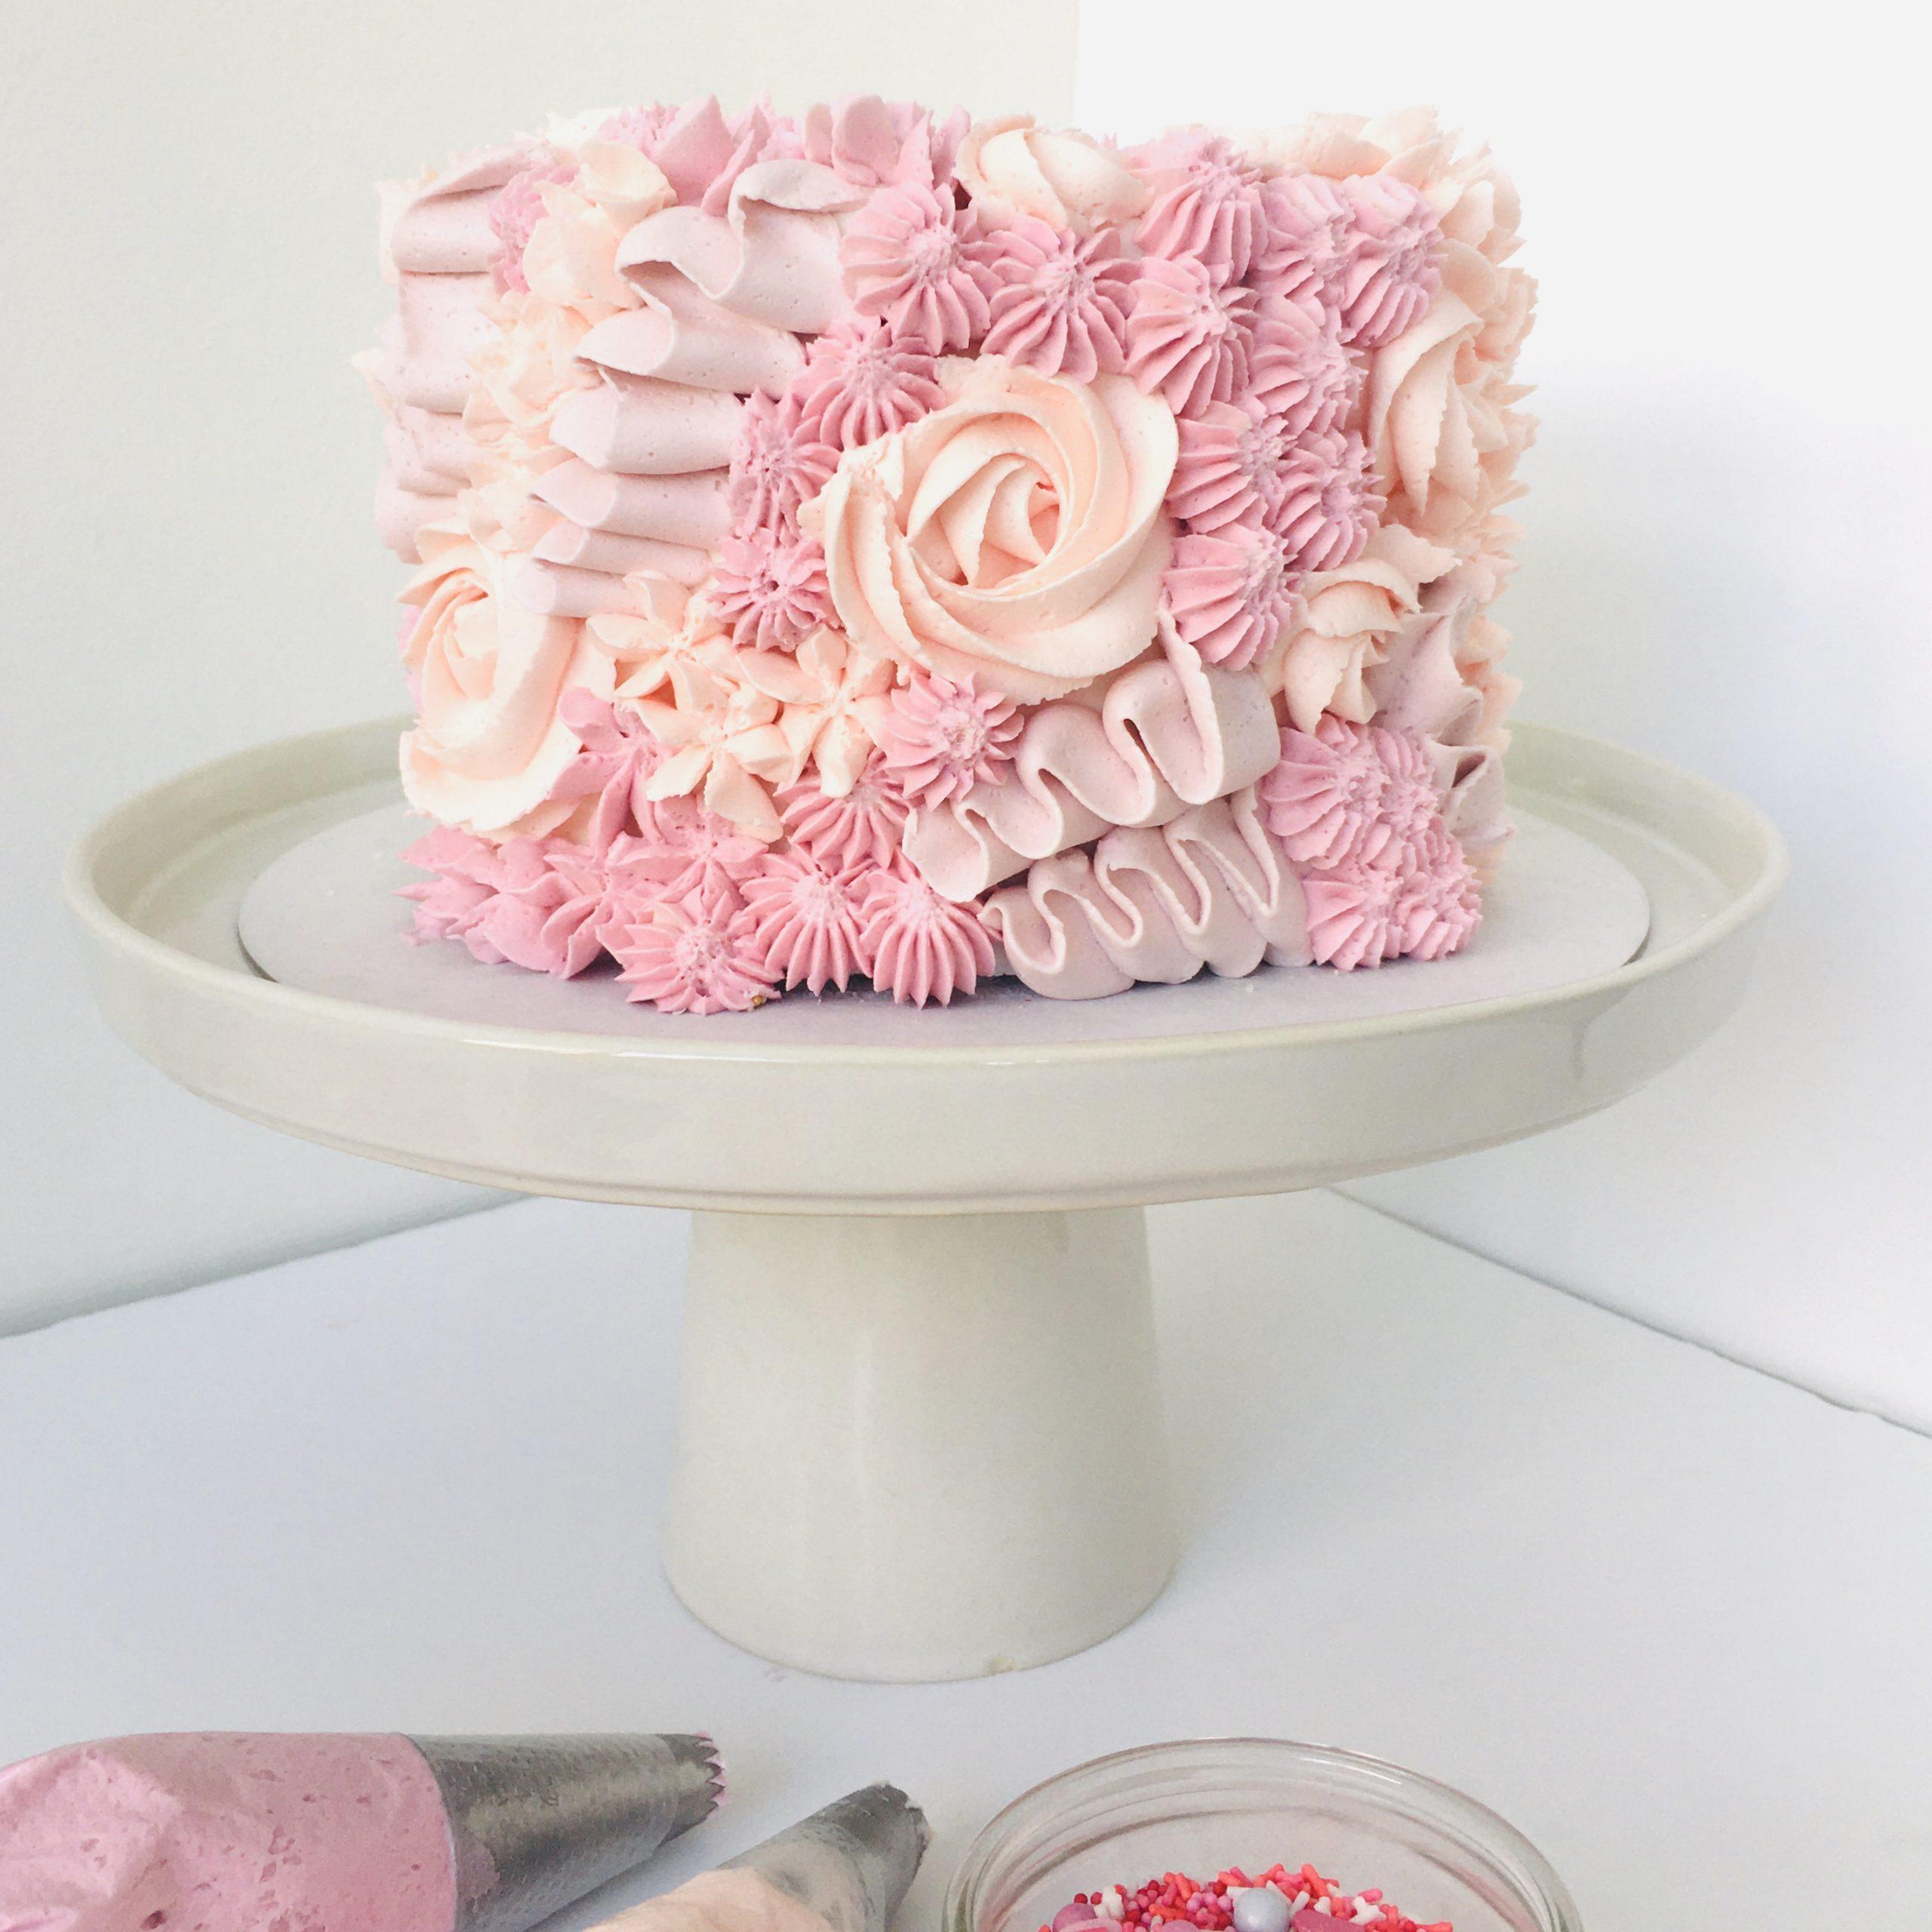 Cake Decorating Classes London - Rock Bakehouse | Rock ...